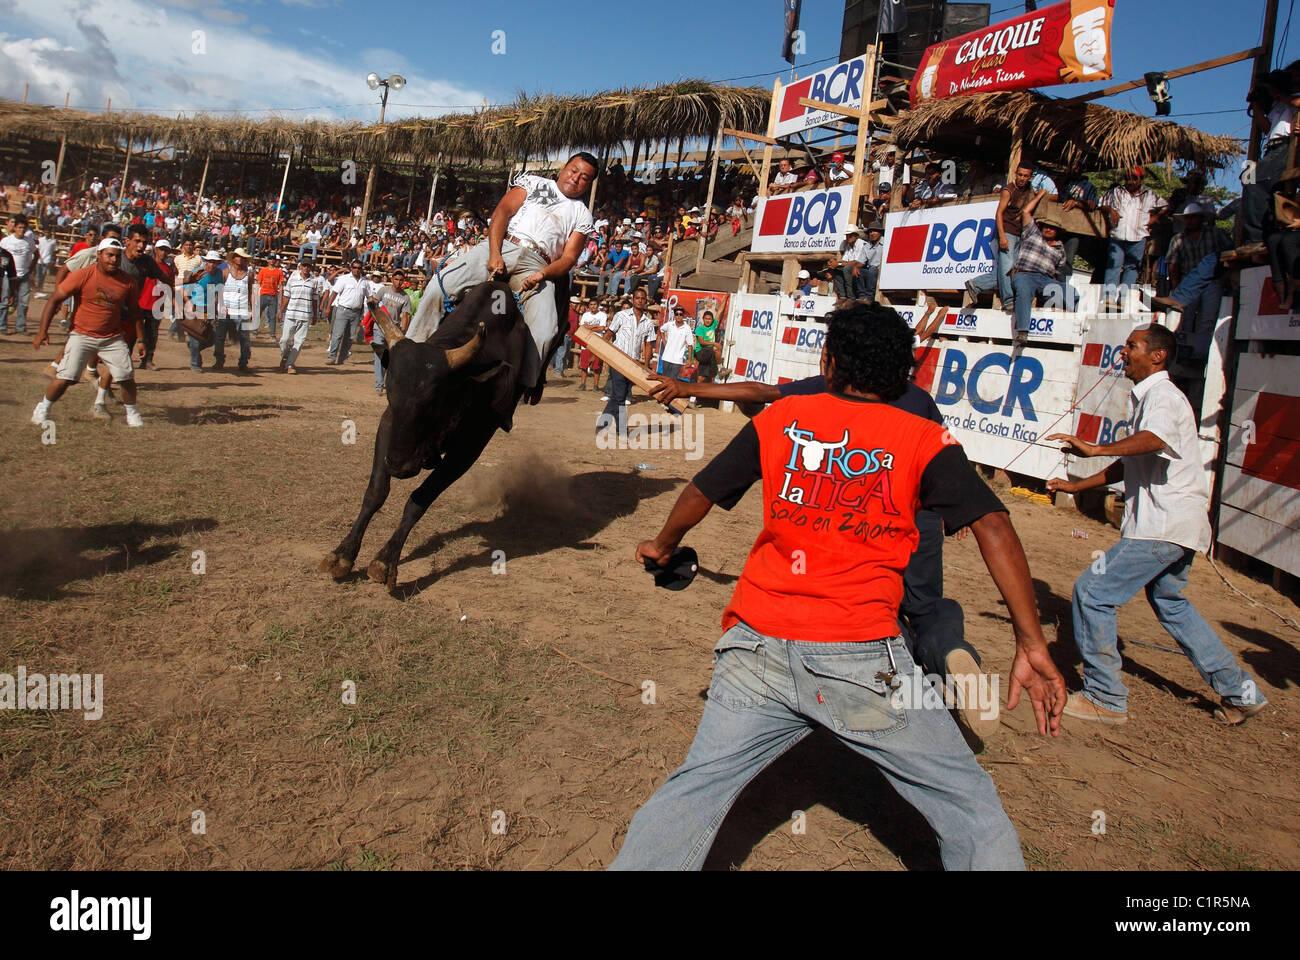 Bull riding during a civic festival, Liberia, Costa Rica - Stock Image